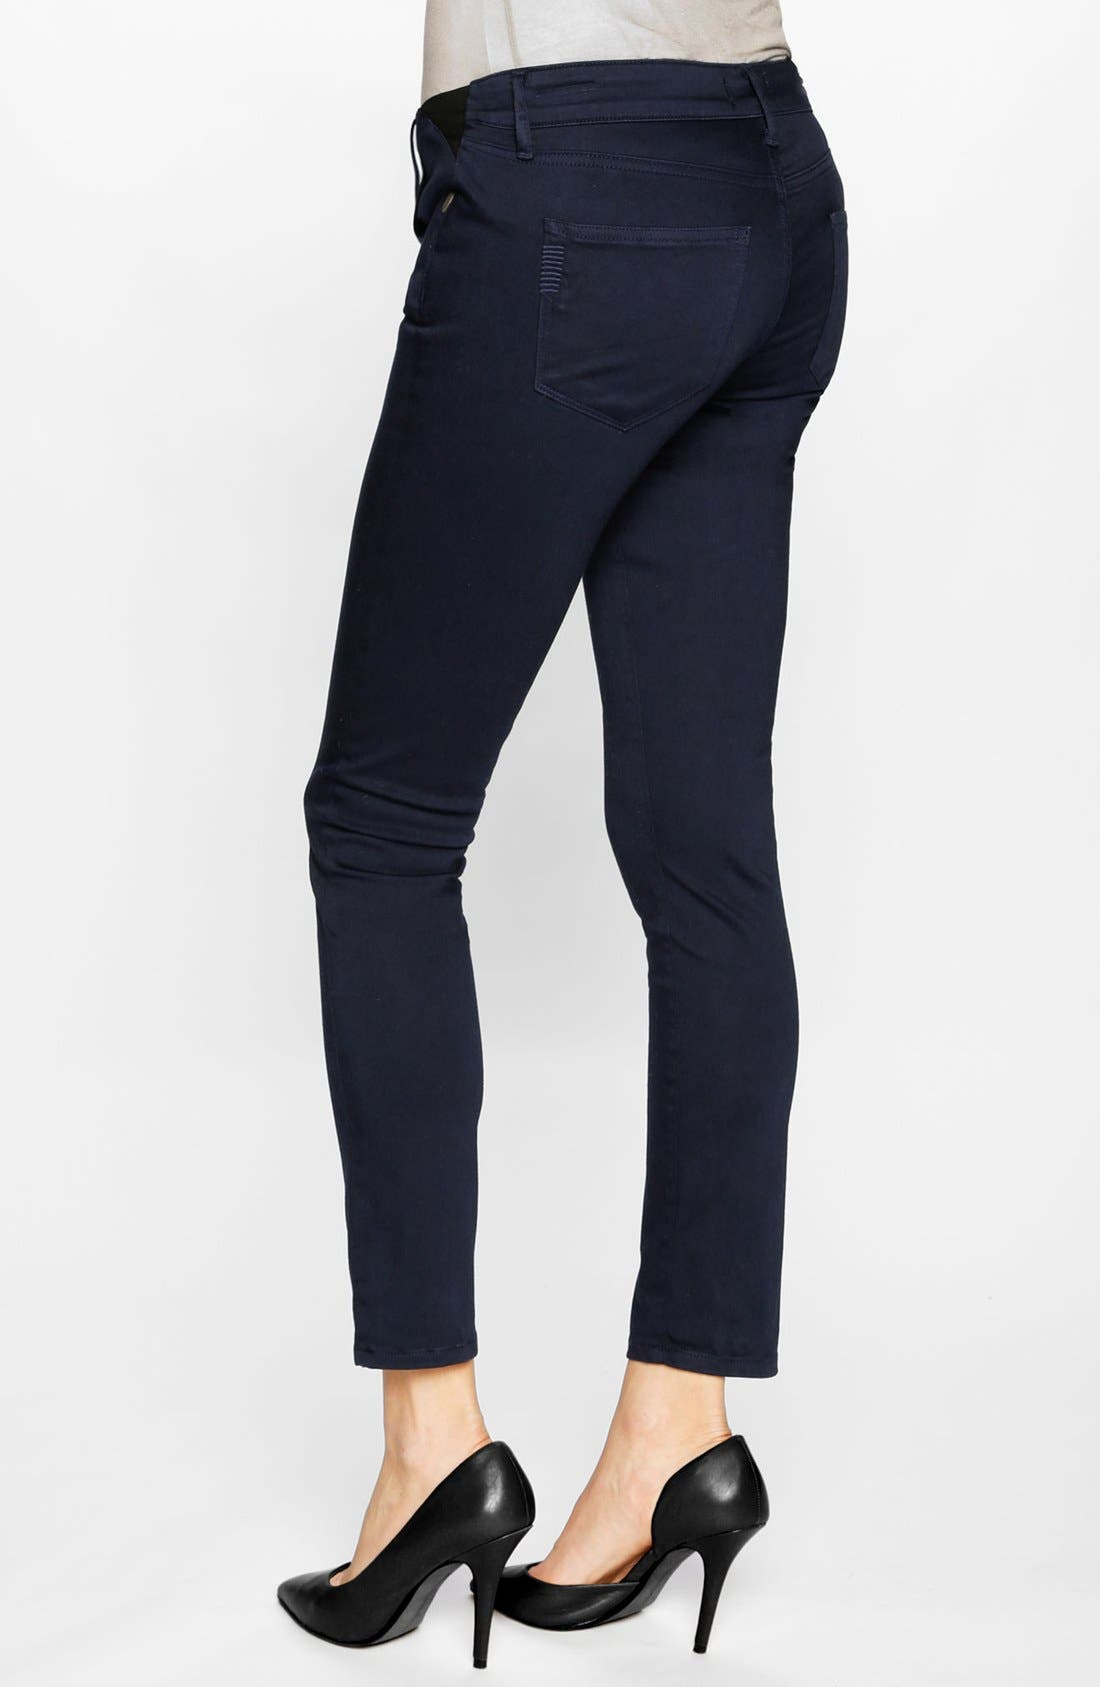 Alternate Image 2  - Paige Denim 'Verdugo' Maternity Ankle Ultra Skinny Jeans (Pacific Dusk)